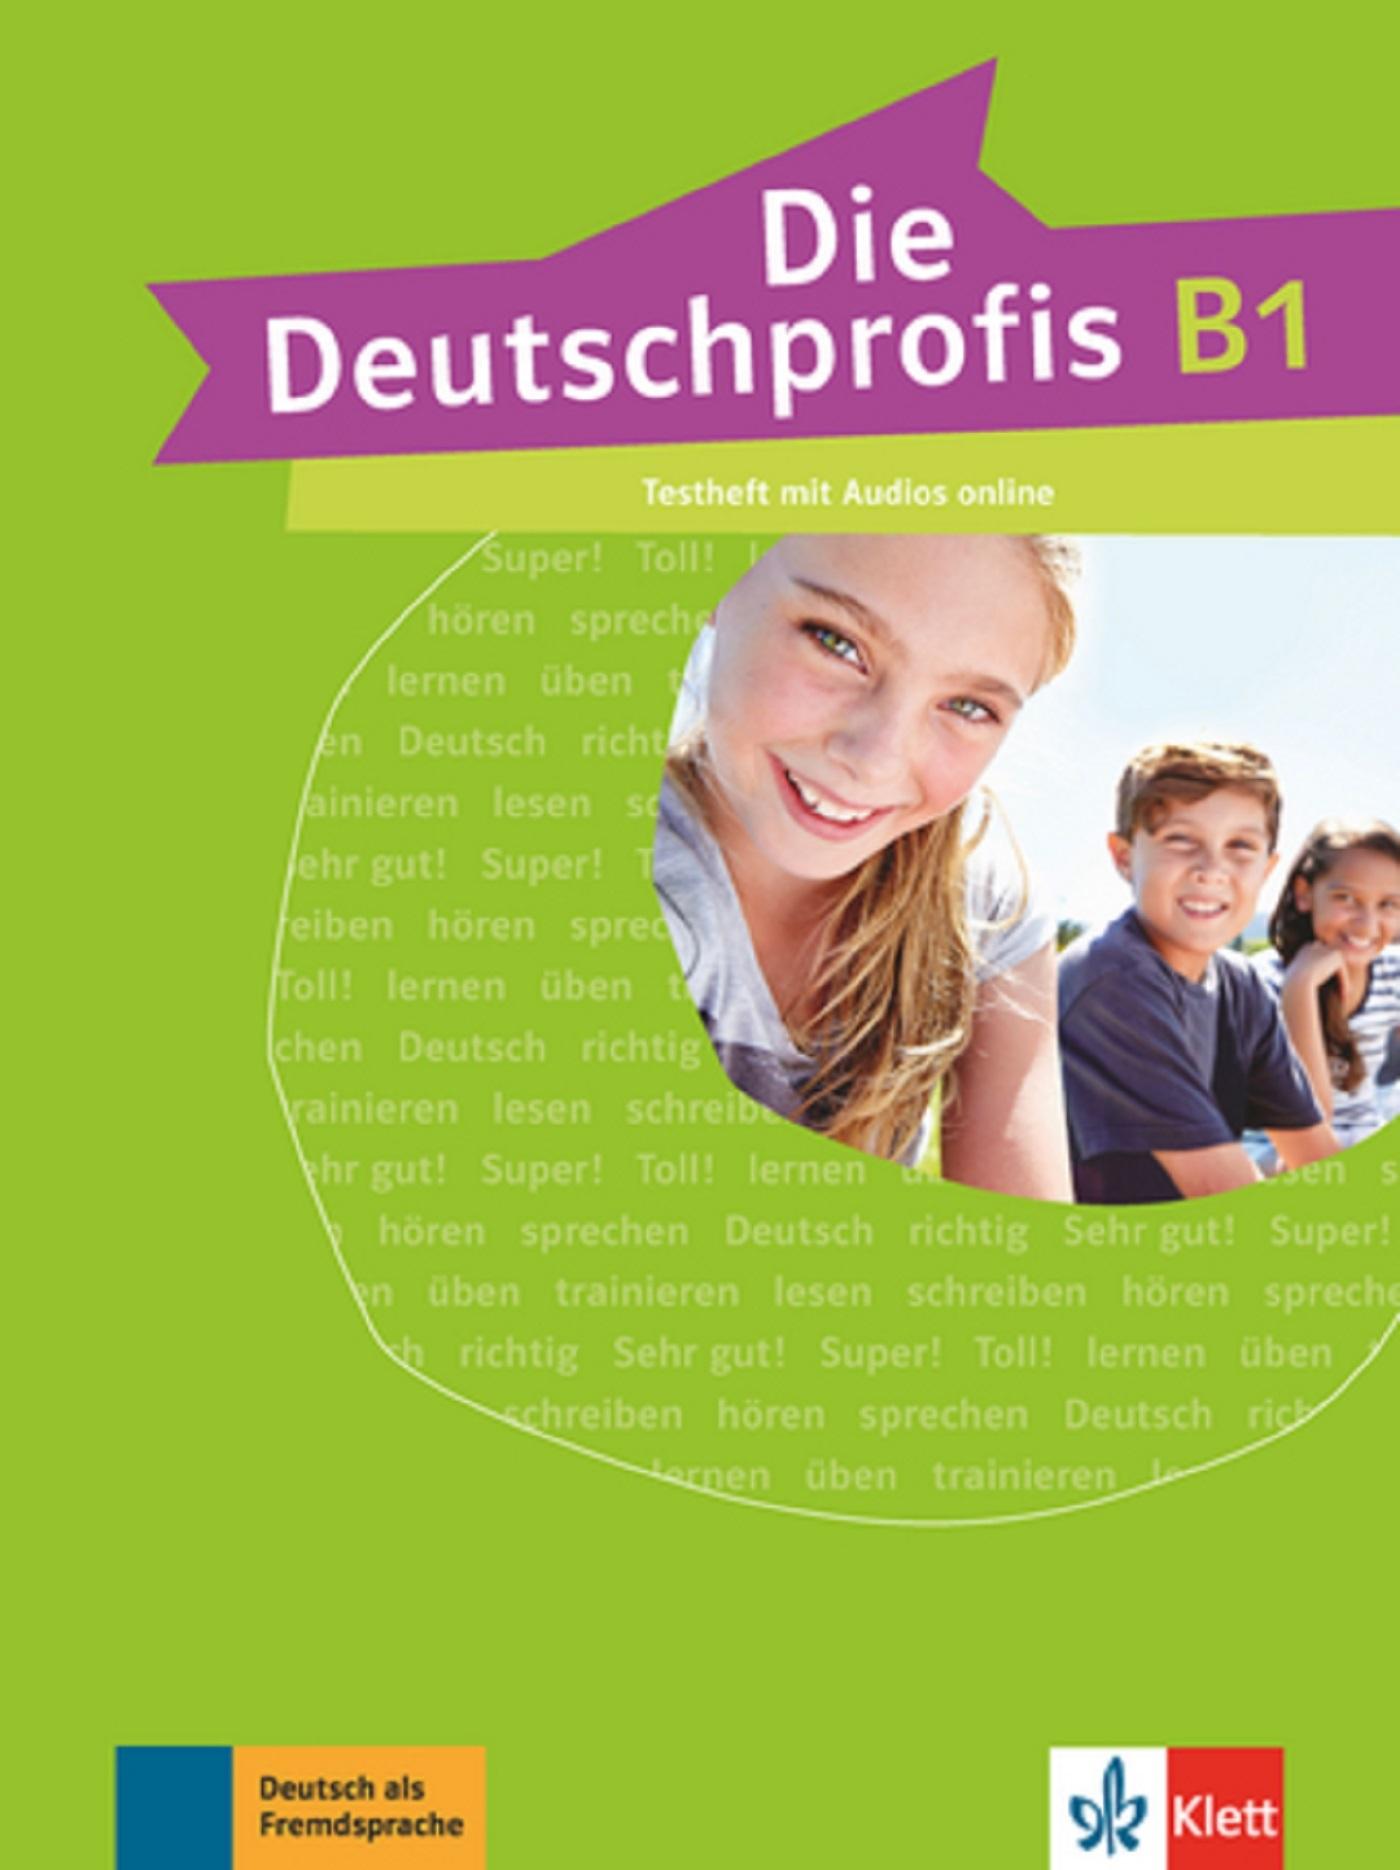 DIE DEUTSCHPROFIS B1 - CAHIER D'EVALUATION